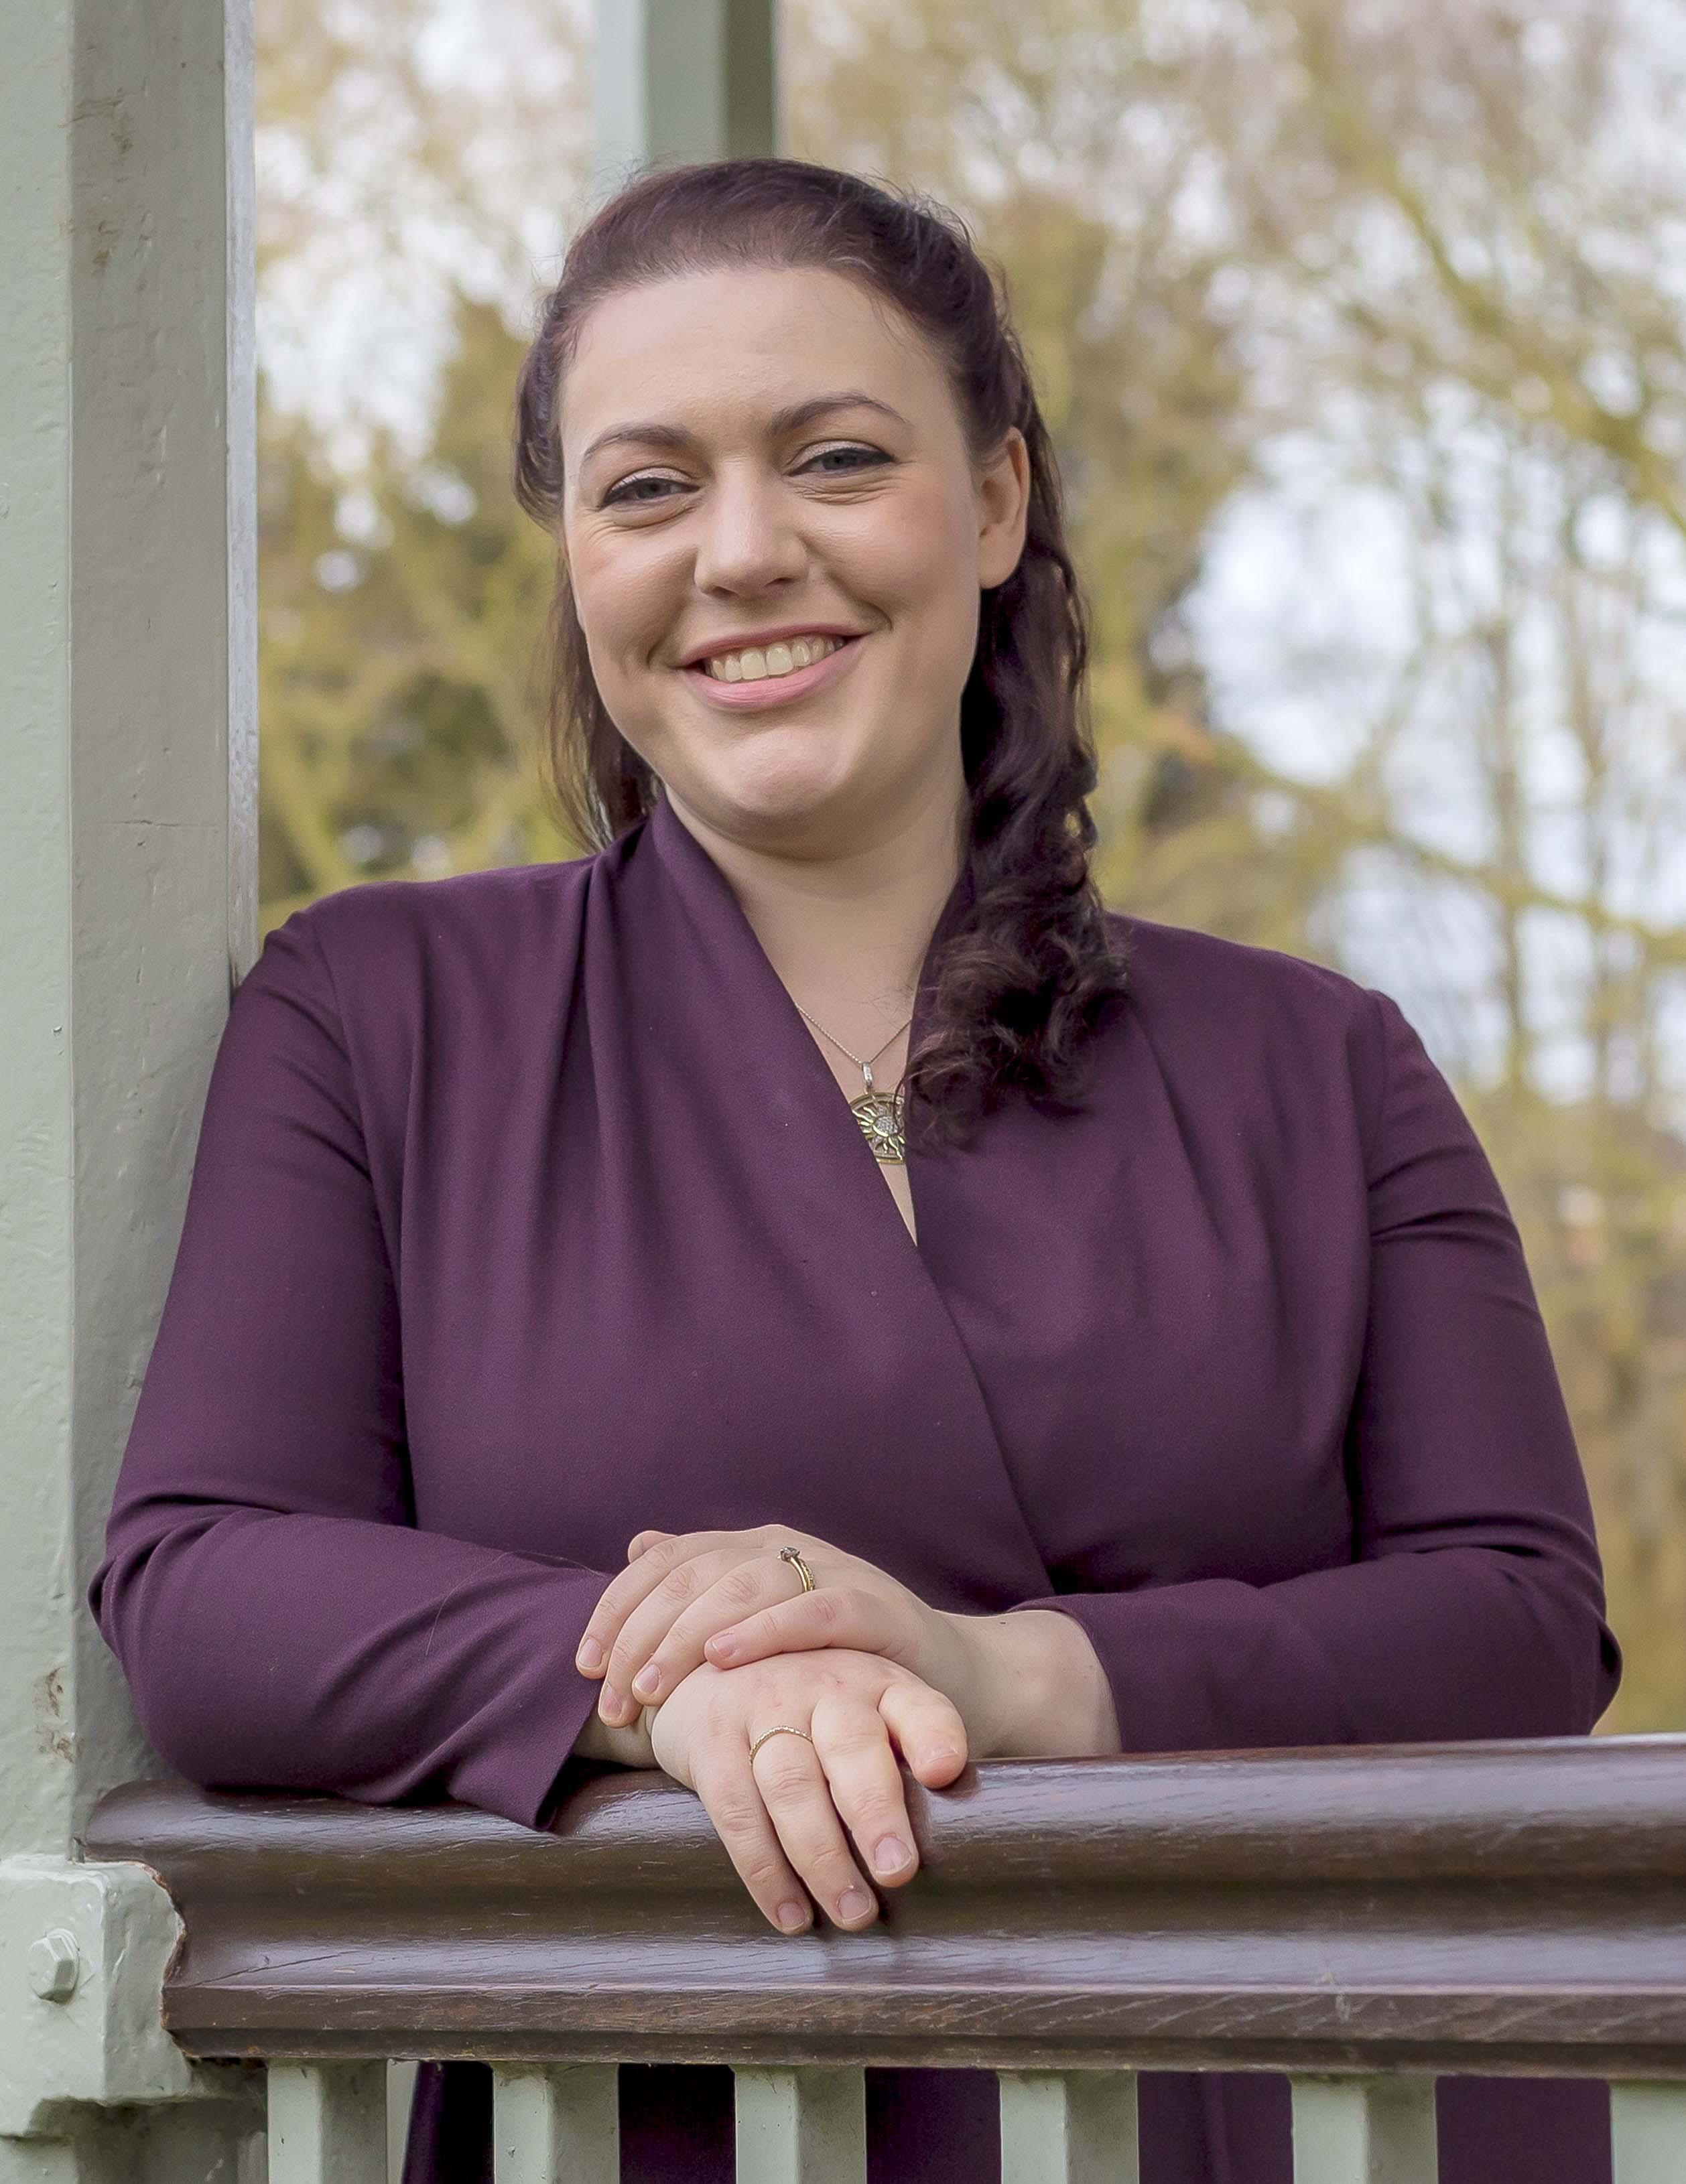 Alicia Kearnes MP for Rutland and Melton